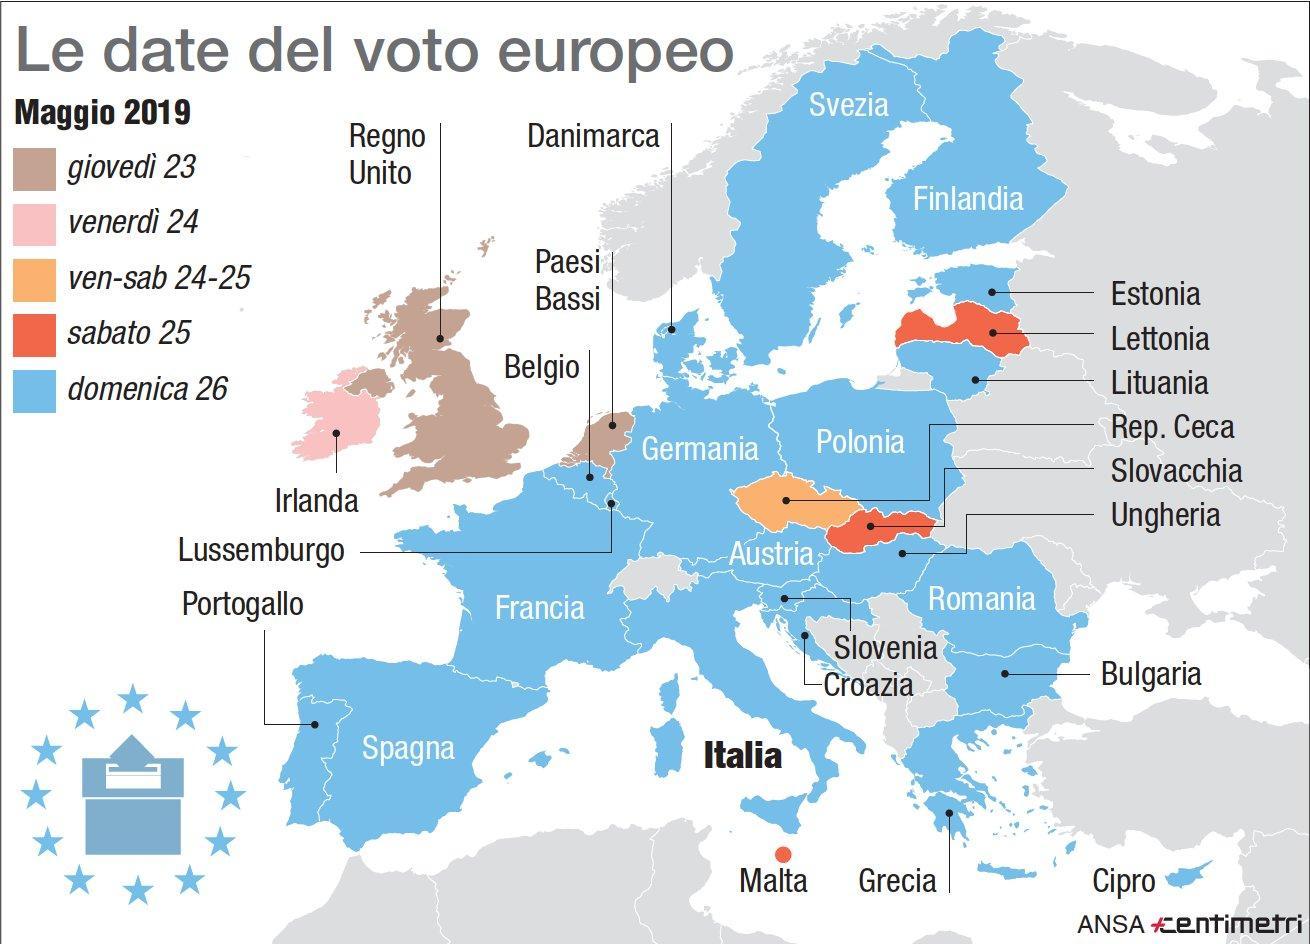 Europee, le date del voto nei vari Stati Ue